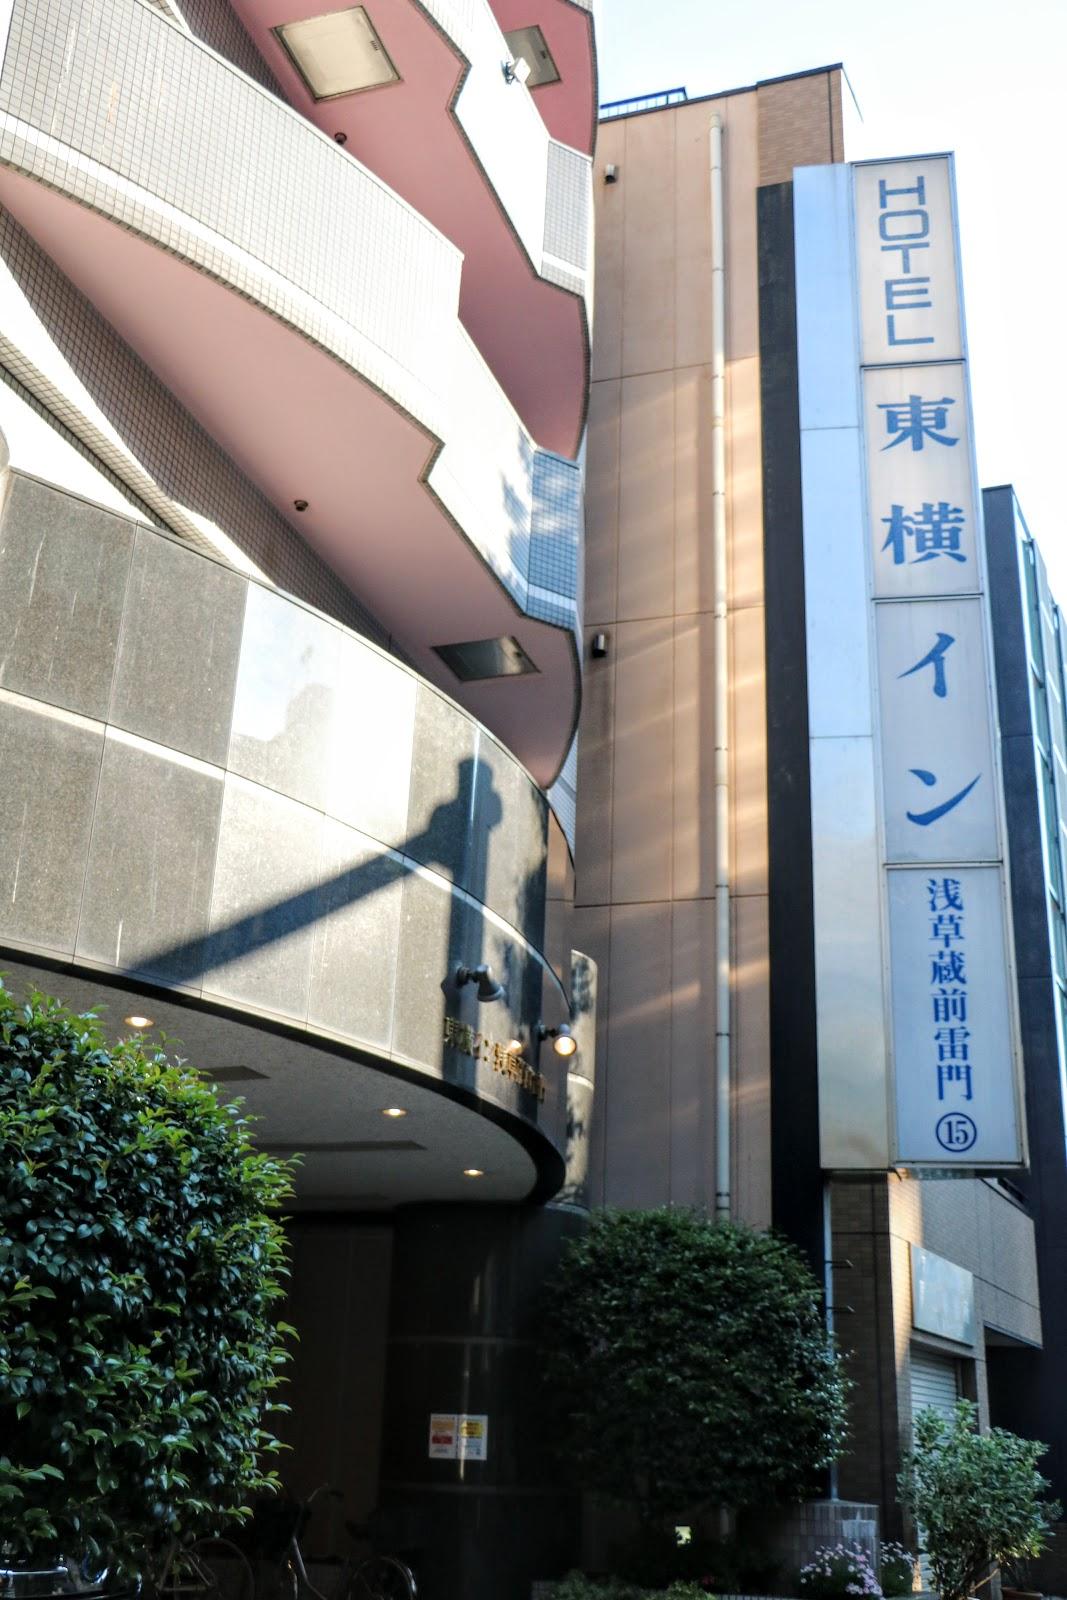 H&D幸福小屋: 東橫INN淺草藏前雷門(52)107年東京.東北.北海道賞花行